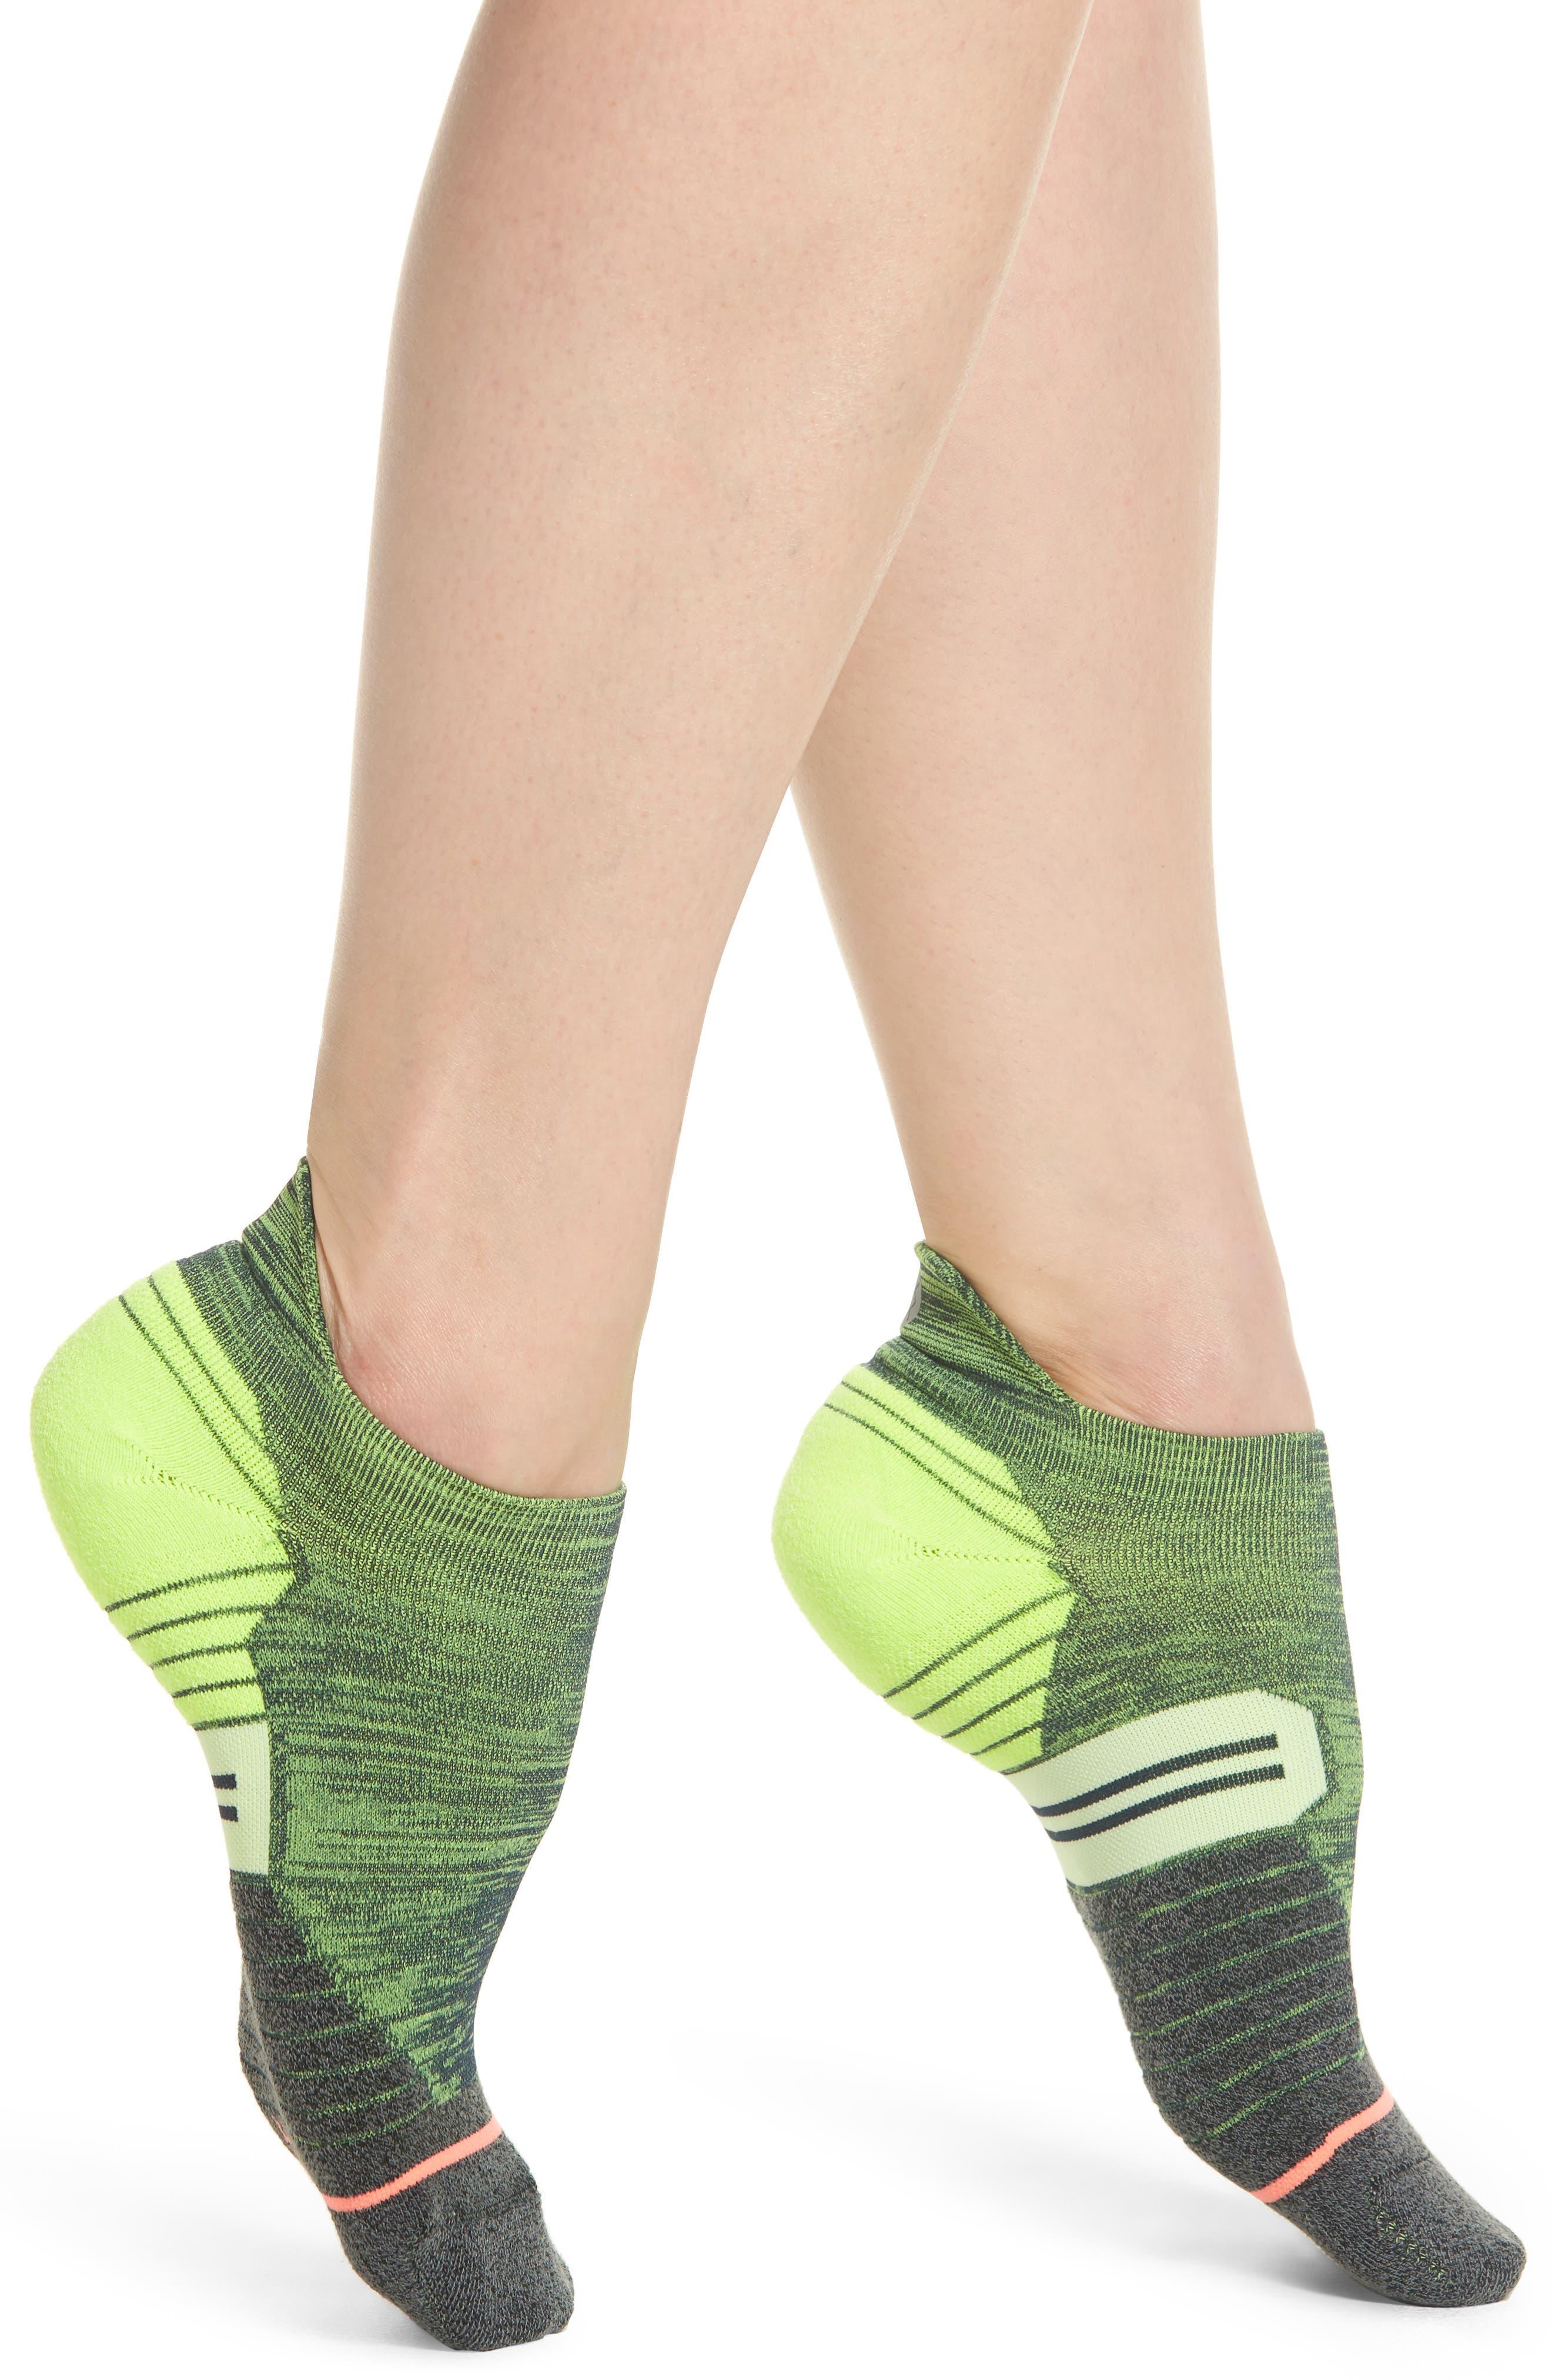 Distance Tab Running Socks,                             Main thumbnail 1, color,                             Green